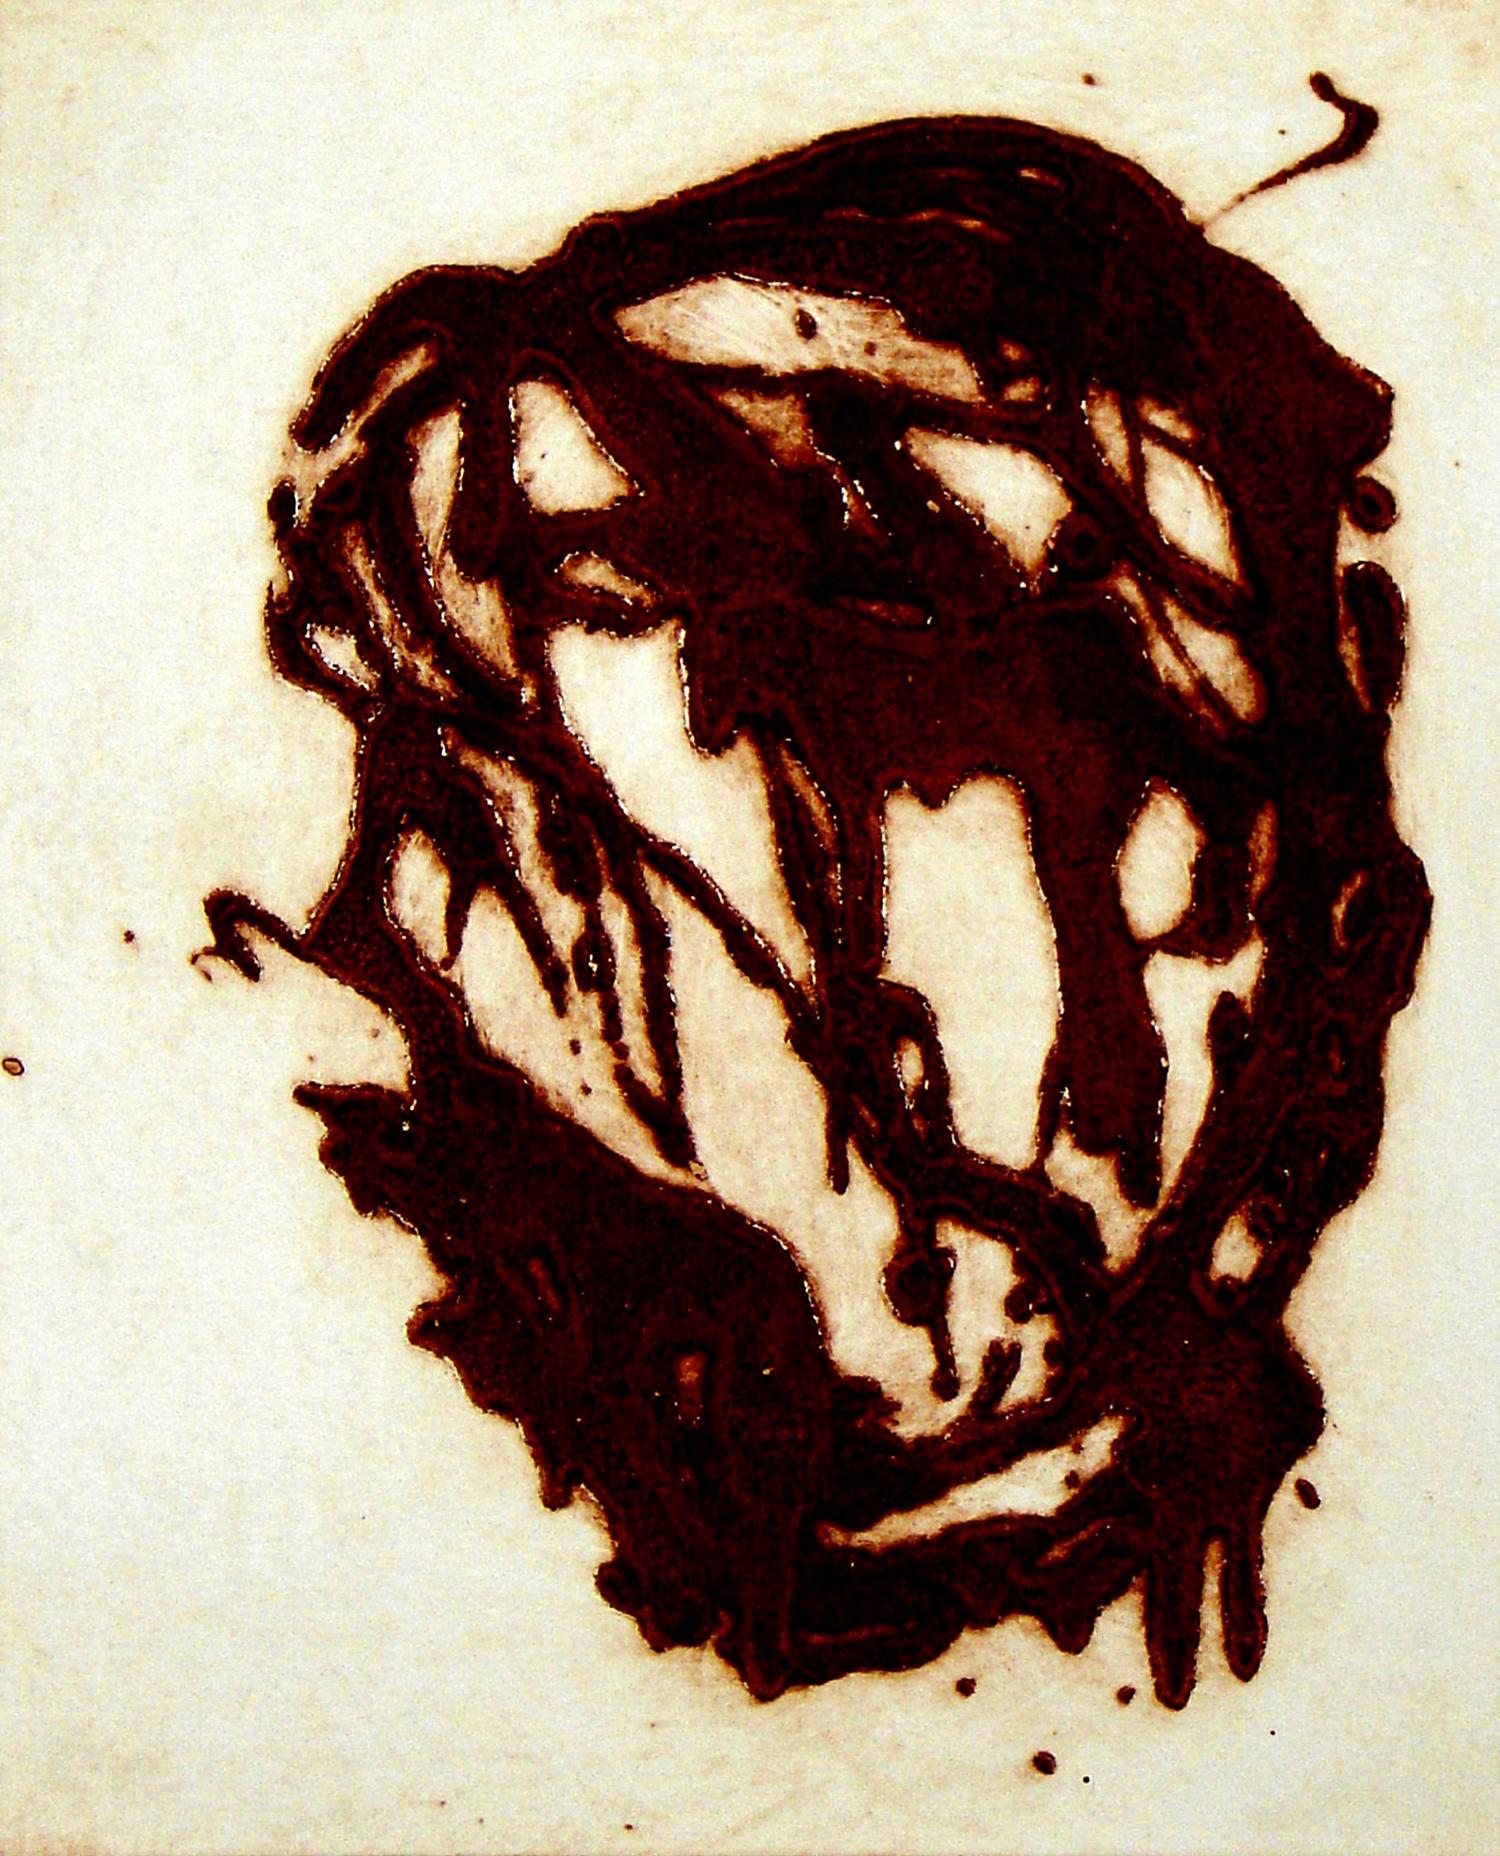 Peter Griffin, Carborundum Head II    Date:  2007   Size (cm - unframed):  45 x 35.5   Technique:  Carborundum Etching   Materials:  Moulin Du Gue 300gsm   Edition size:  6   Publisher:  The Artist   Copyright:  The Artist    P.O.A.